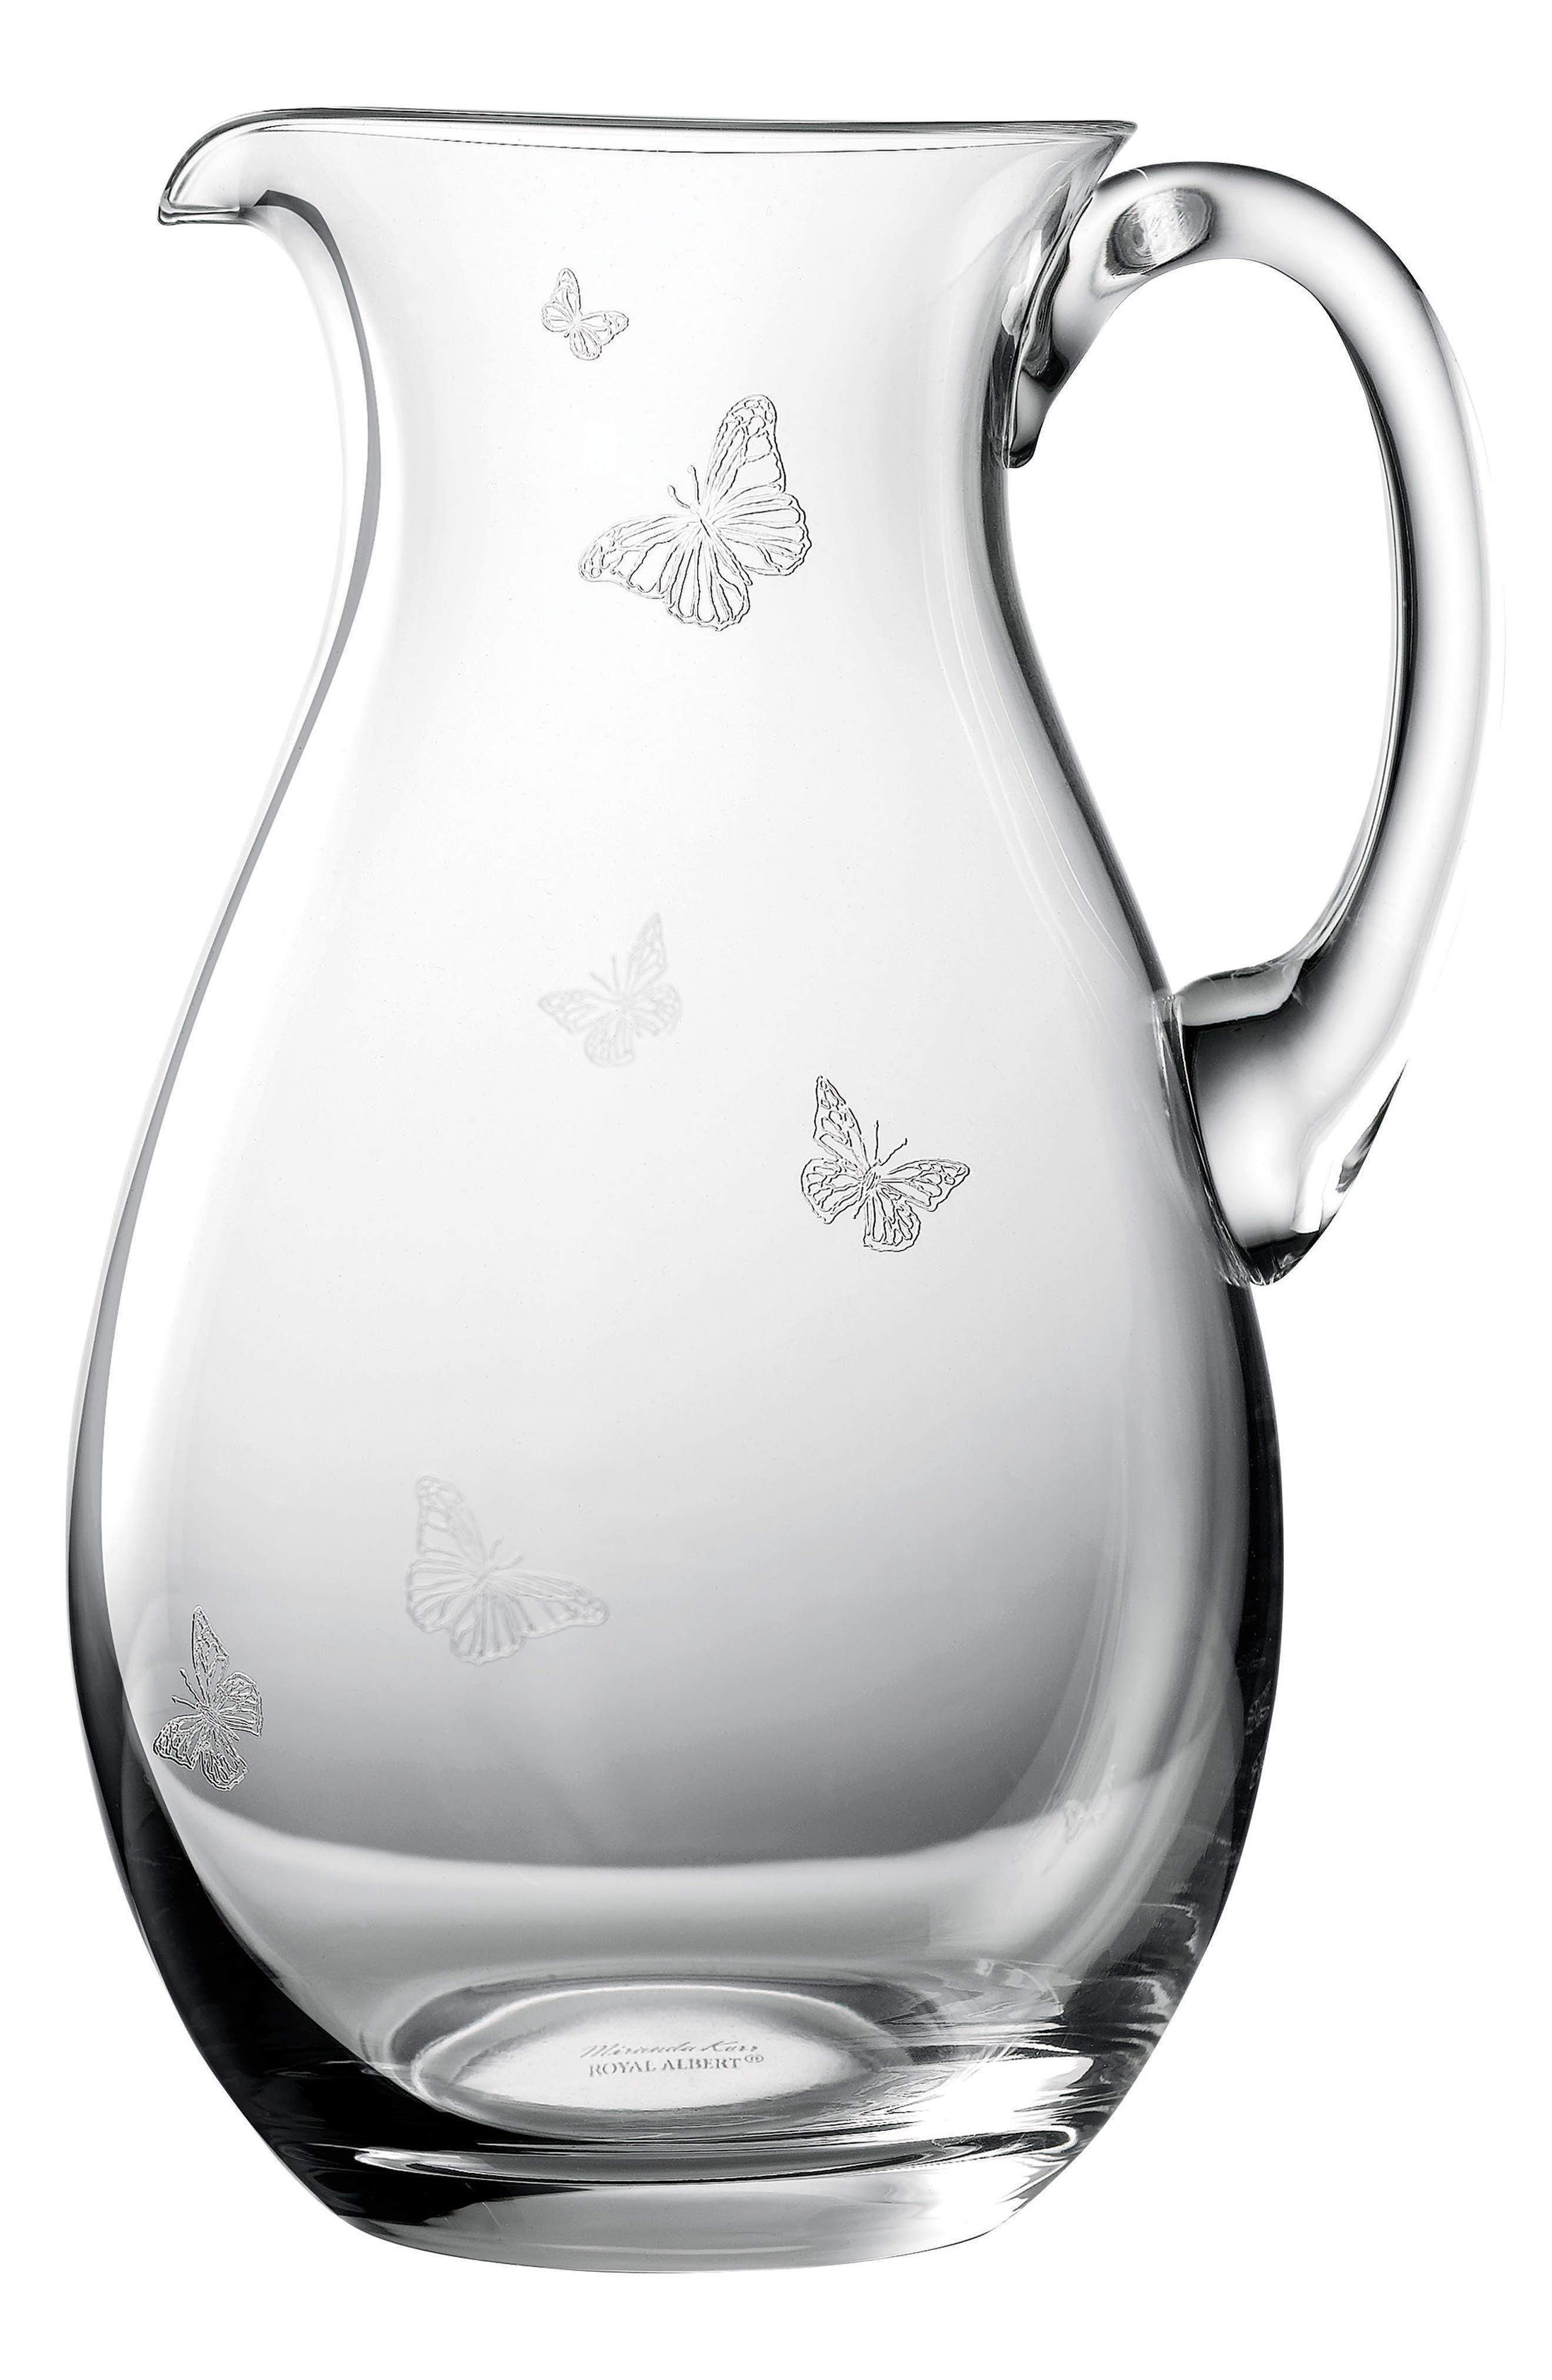 Main Image - Miranda Kerr for Royal Albert Friendship Glass Pitcher